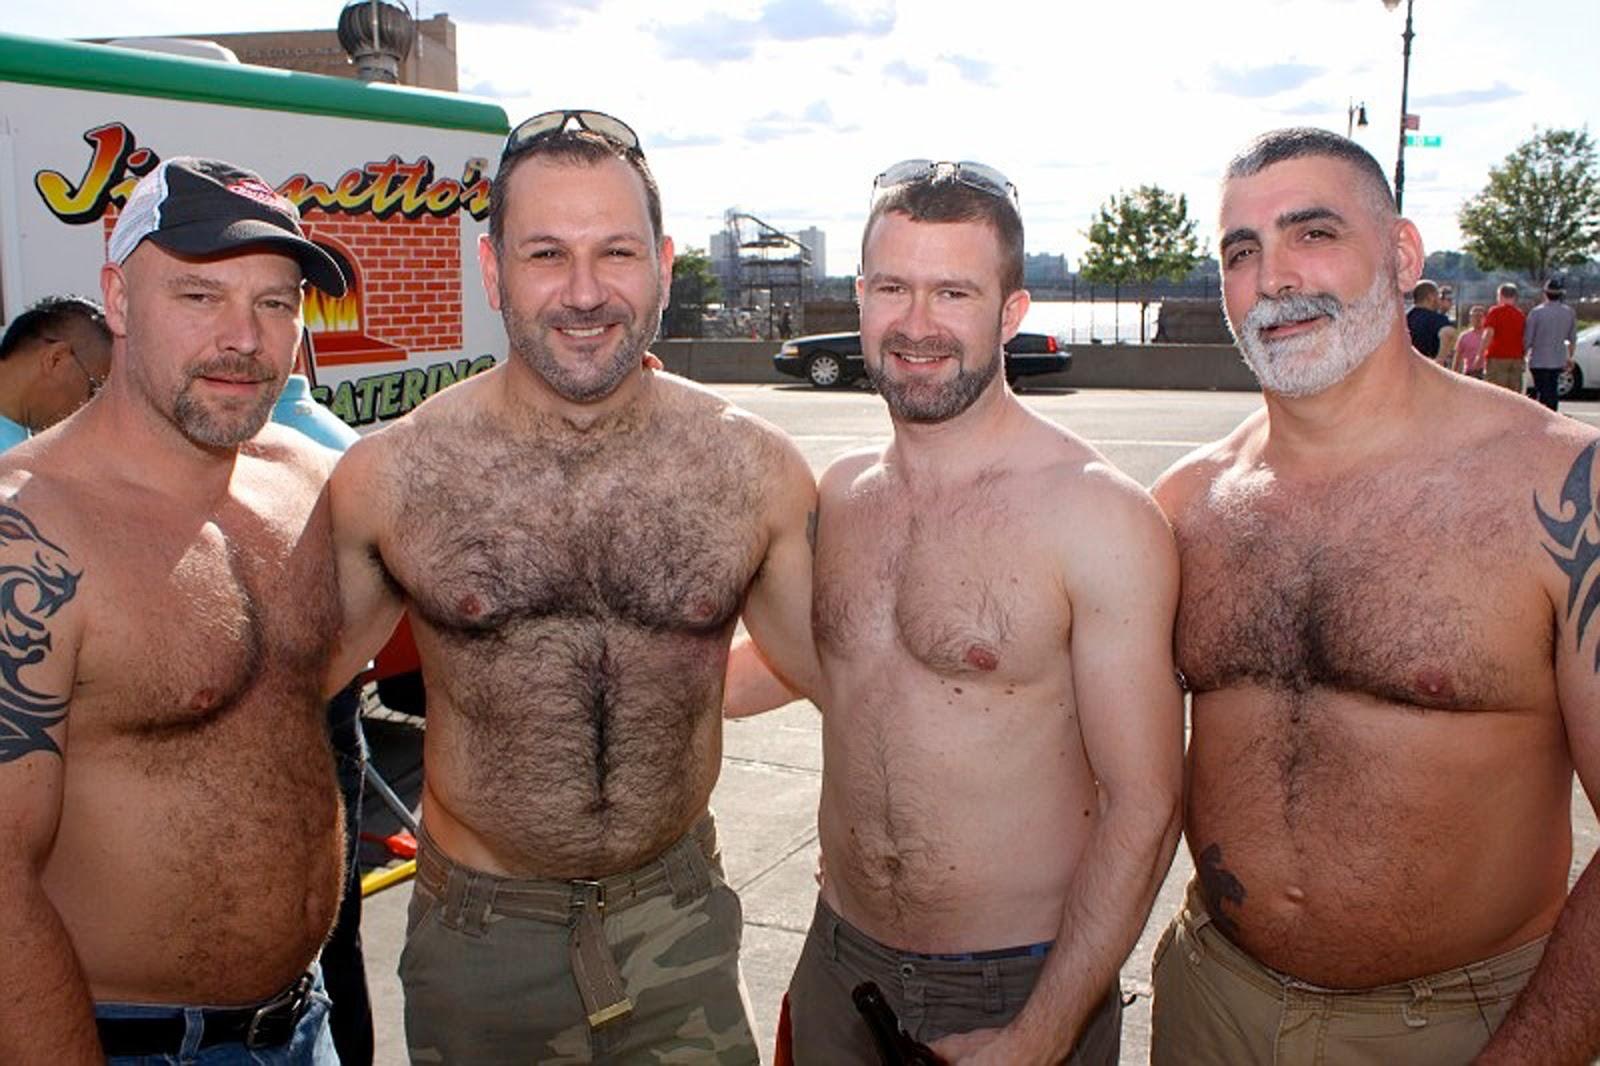 homoseksuel side 6 massage fantasy world escort